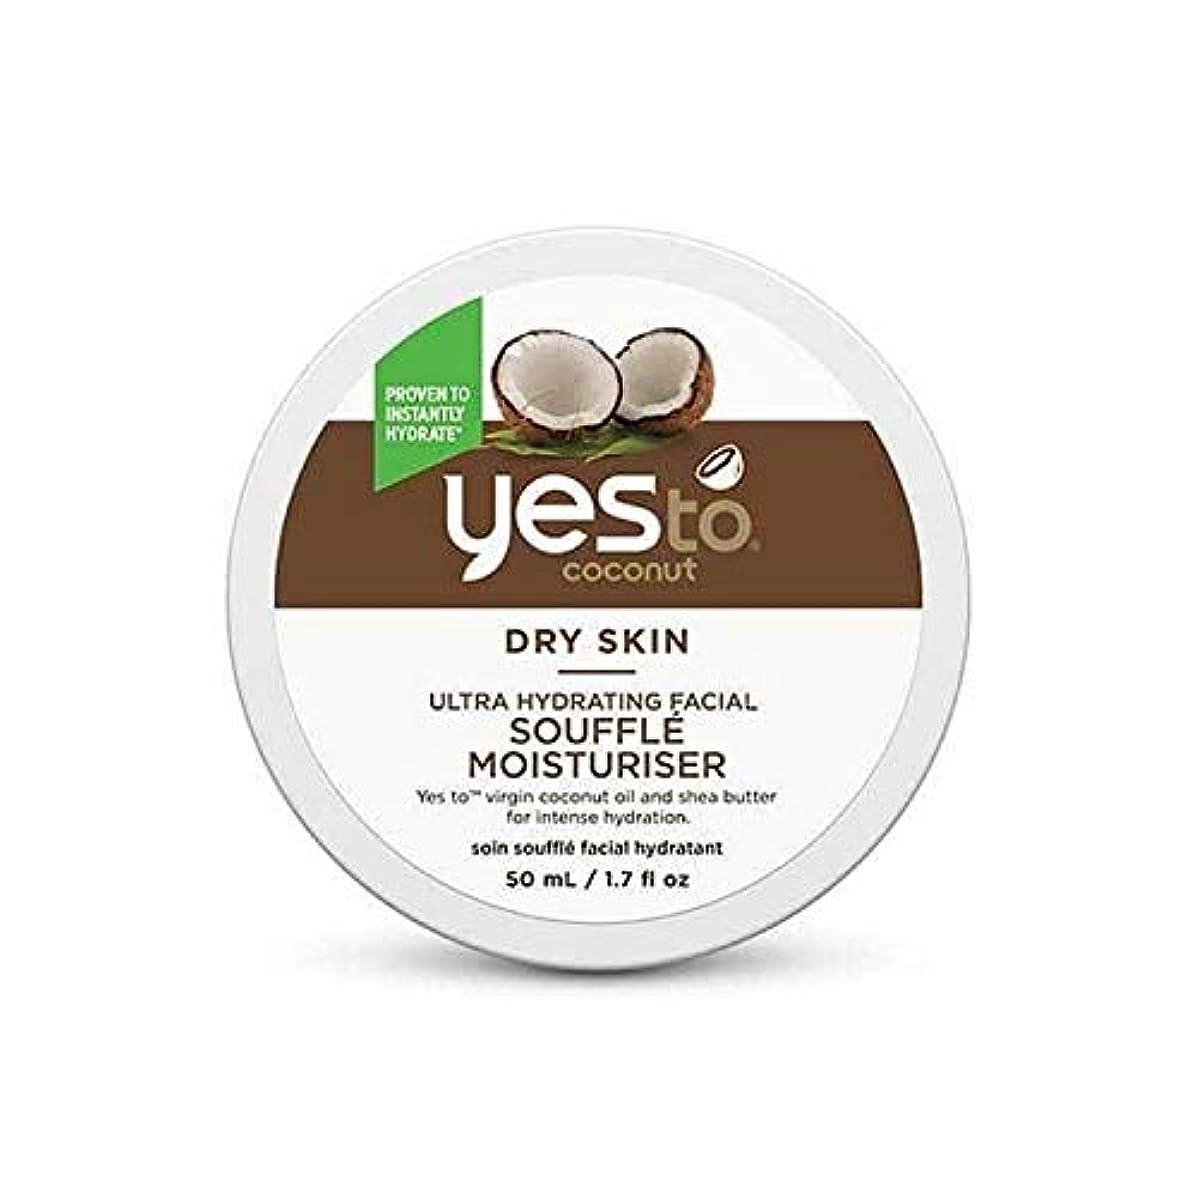 [YES TO! ] はい、超水和顔のスフレの保湿剤をココナッツします - Yes To Coconut Ultra Hydrating Facial Souffl? Moisturiser [並行輸入品]